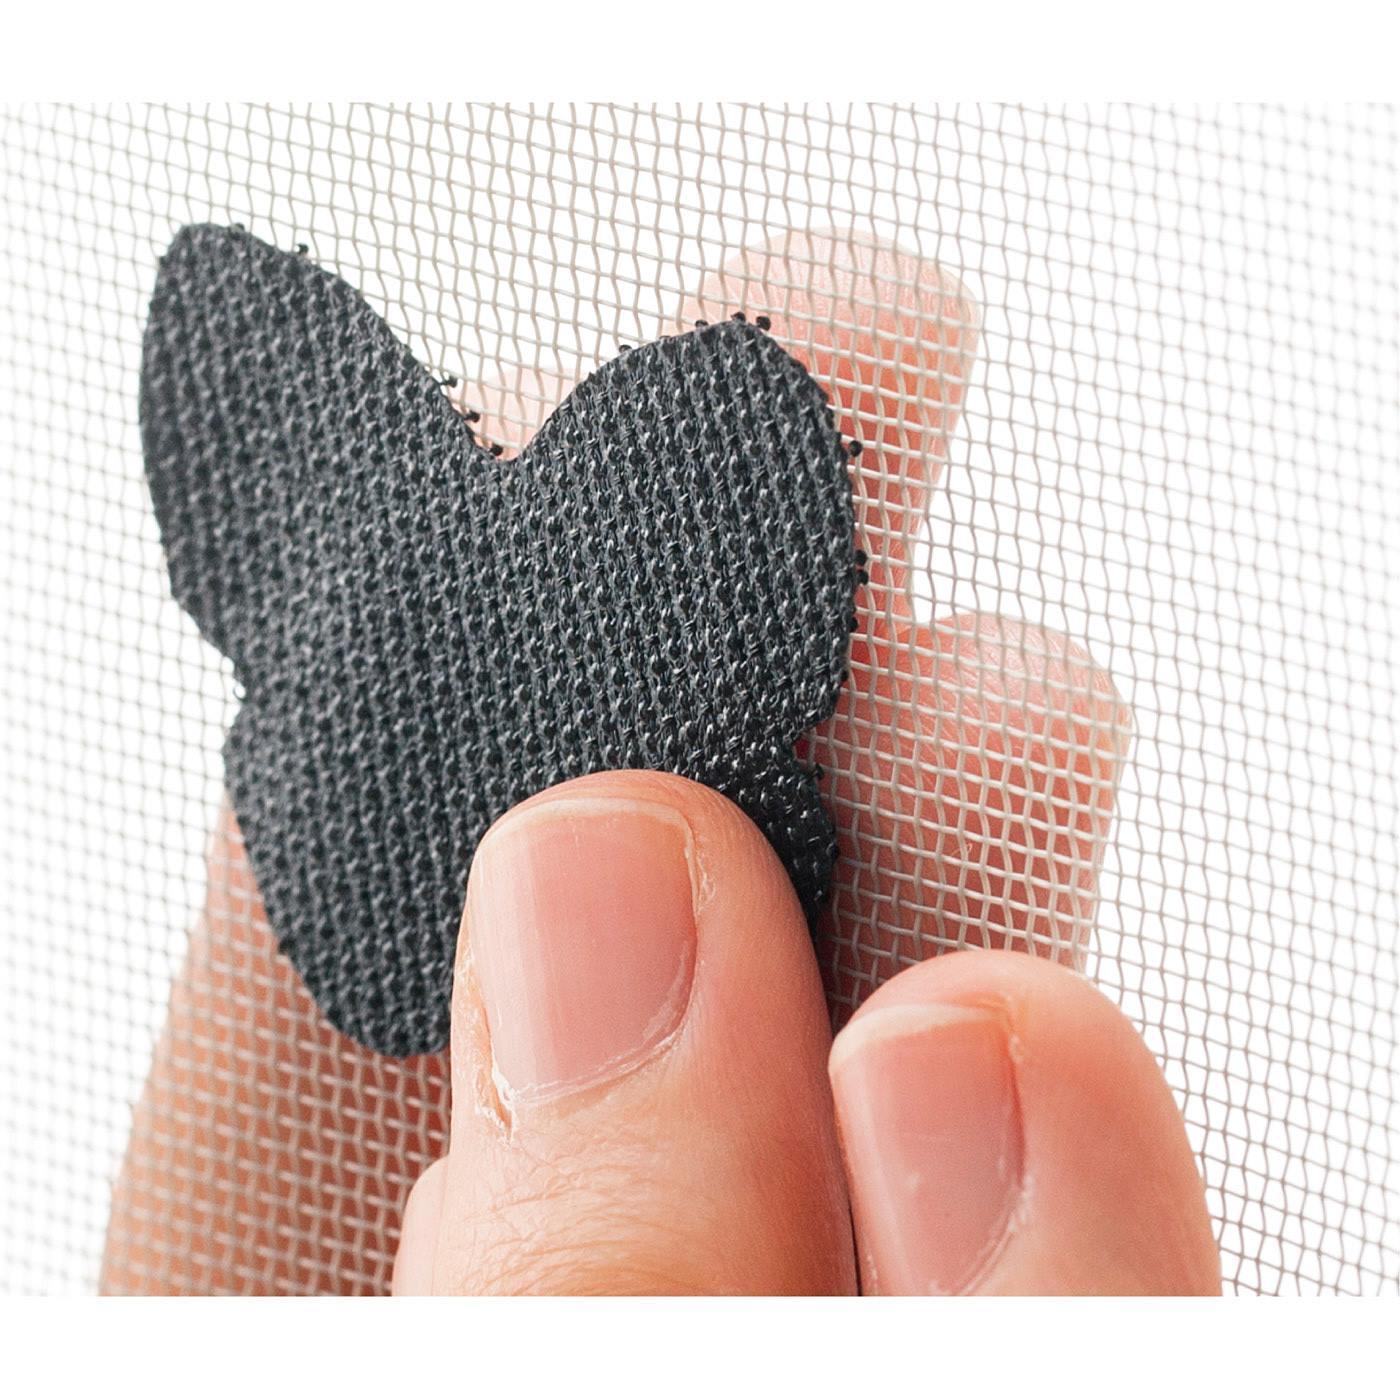 How to use ペタッと面ファスナーみたいに貼るだけ。編み目の両面から指先で押し付けます。